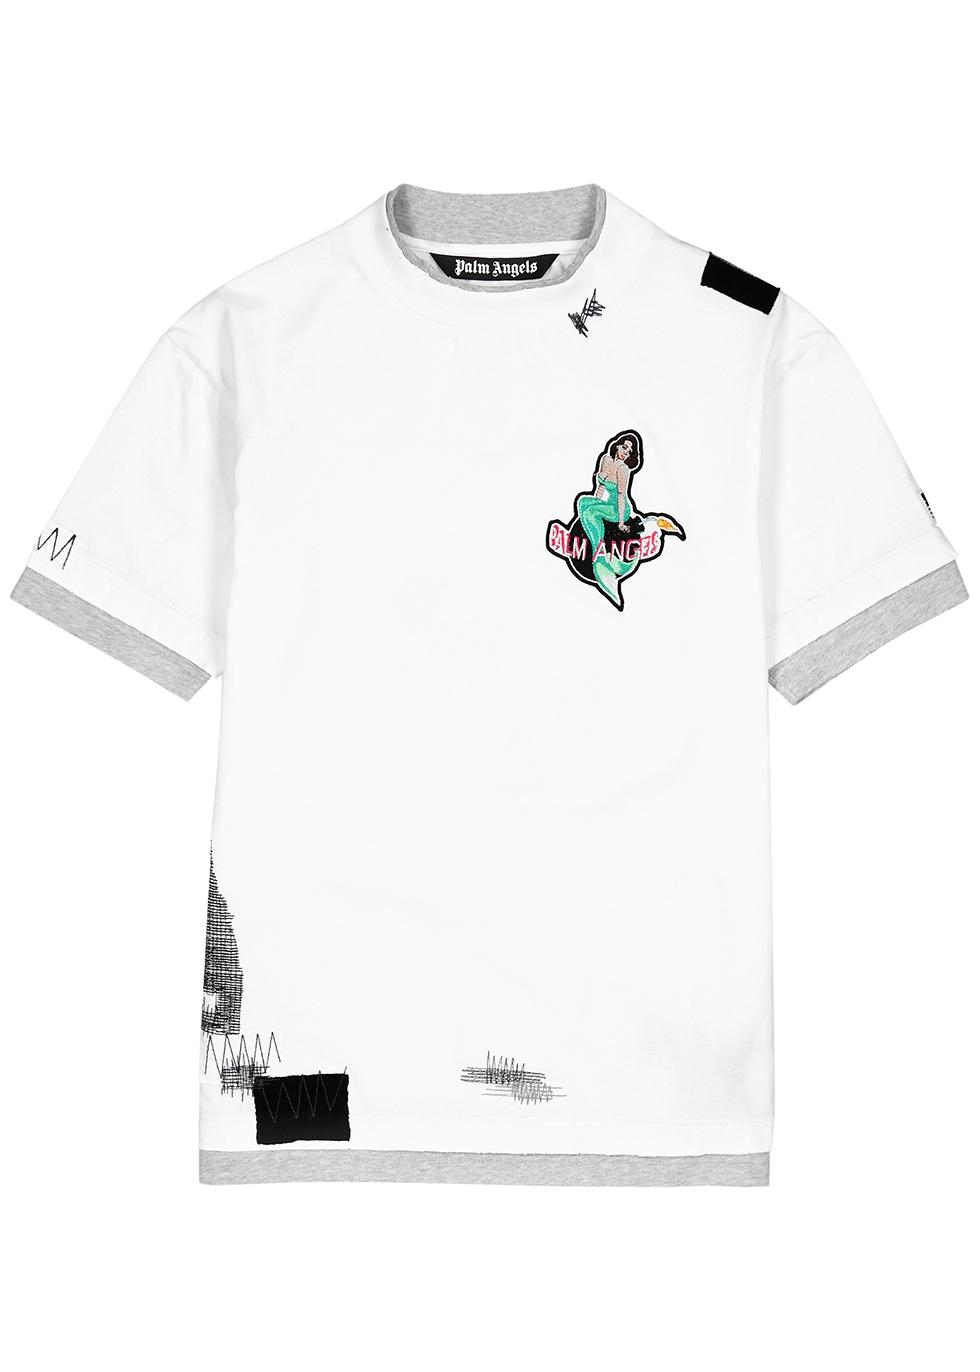 White distressed cotton T-shirt